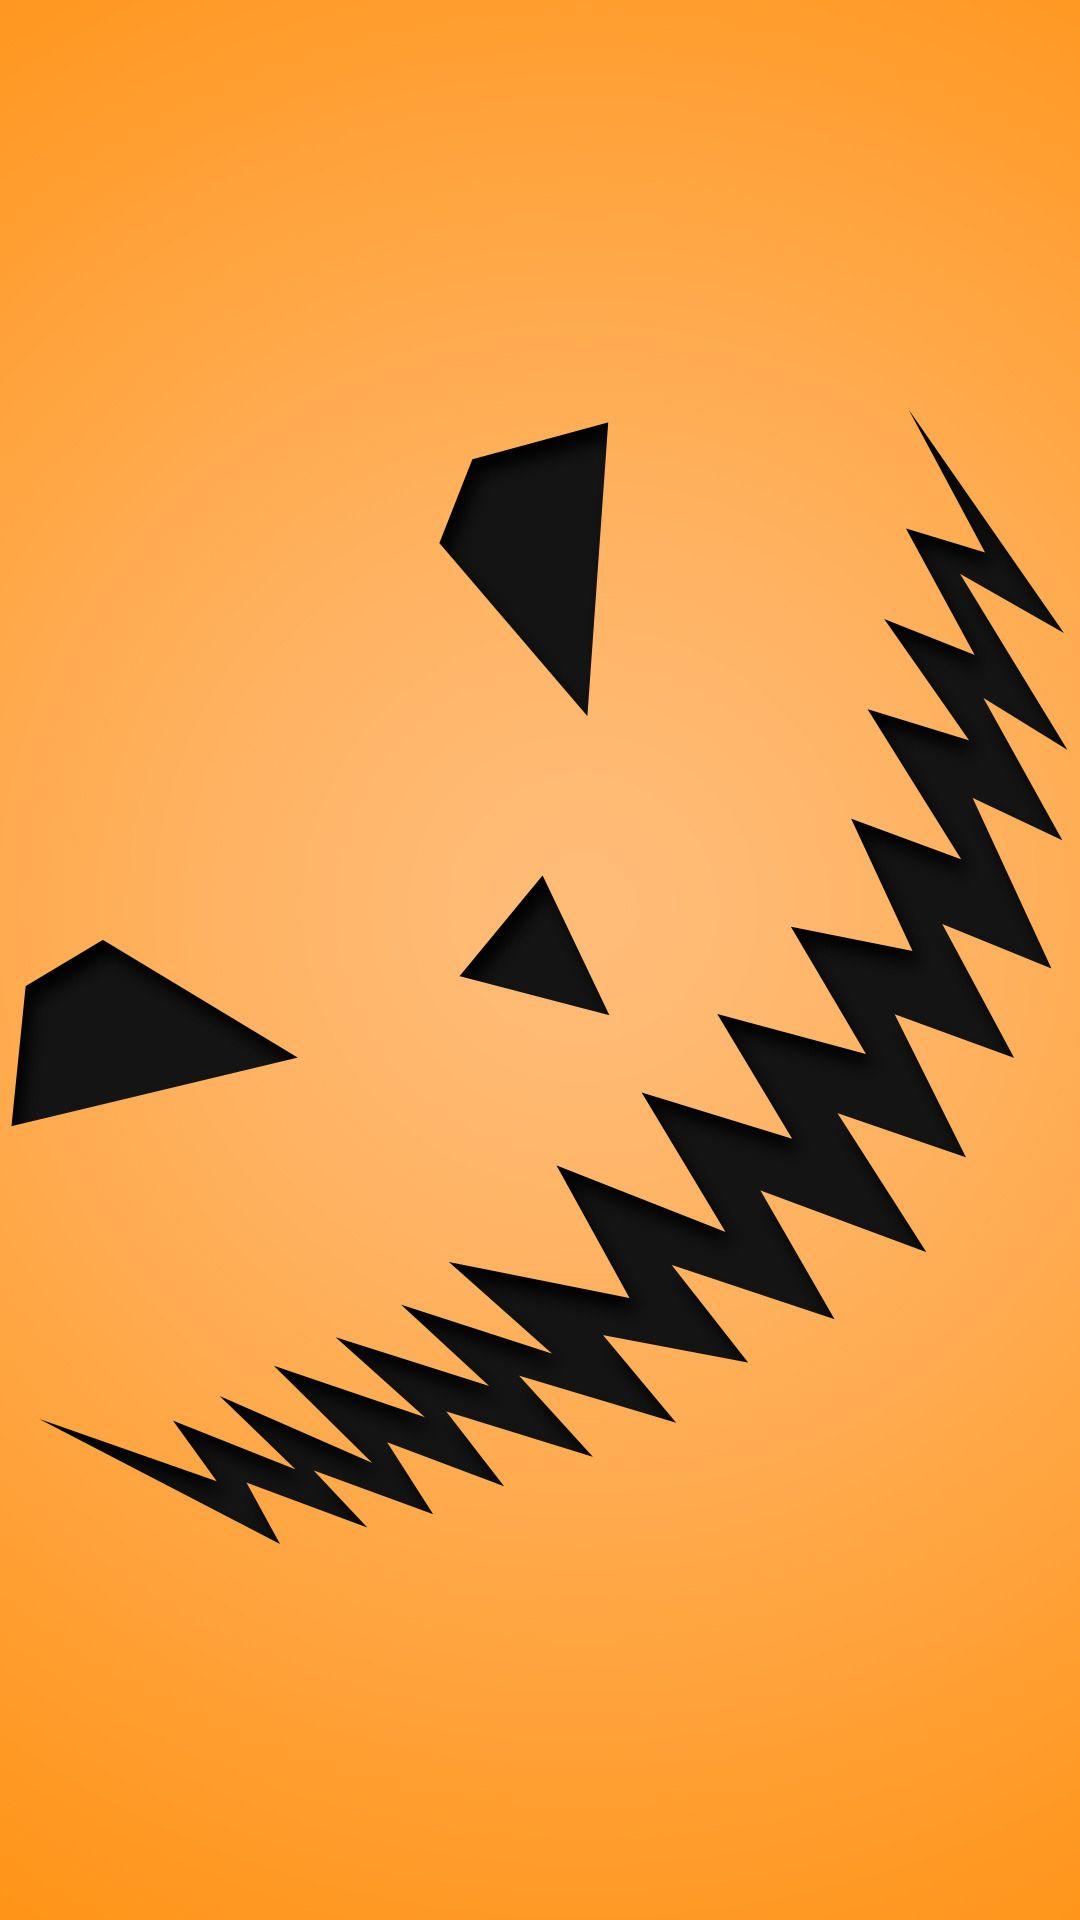 Jack O Lantern Face Halloween IPhone 6 IPhone 6 Plus Wallpaper